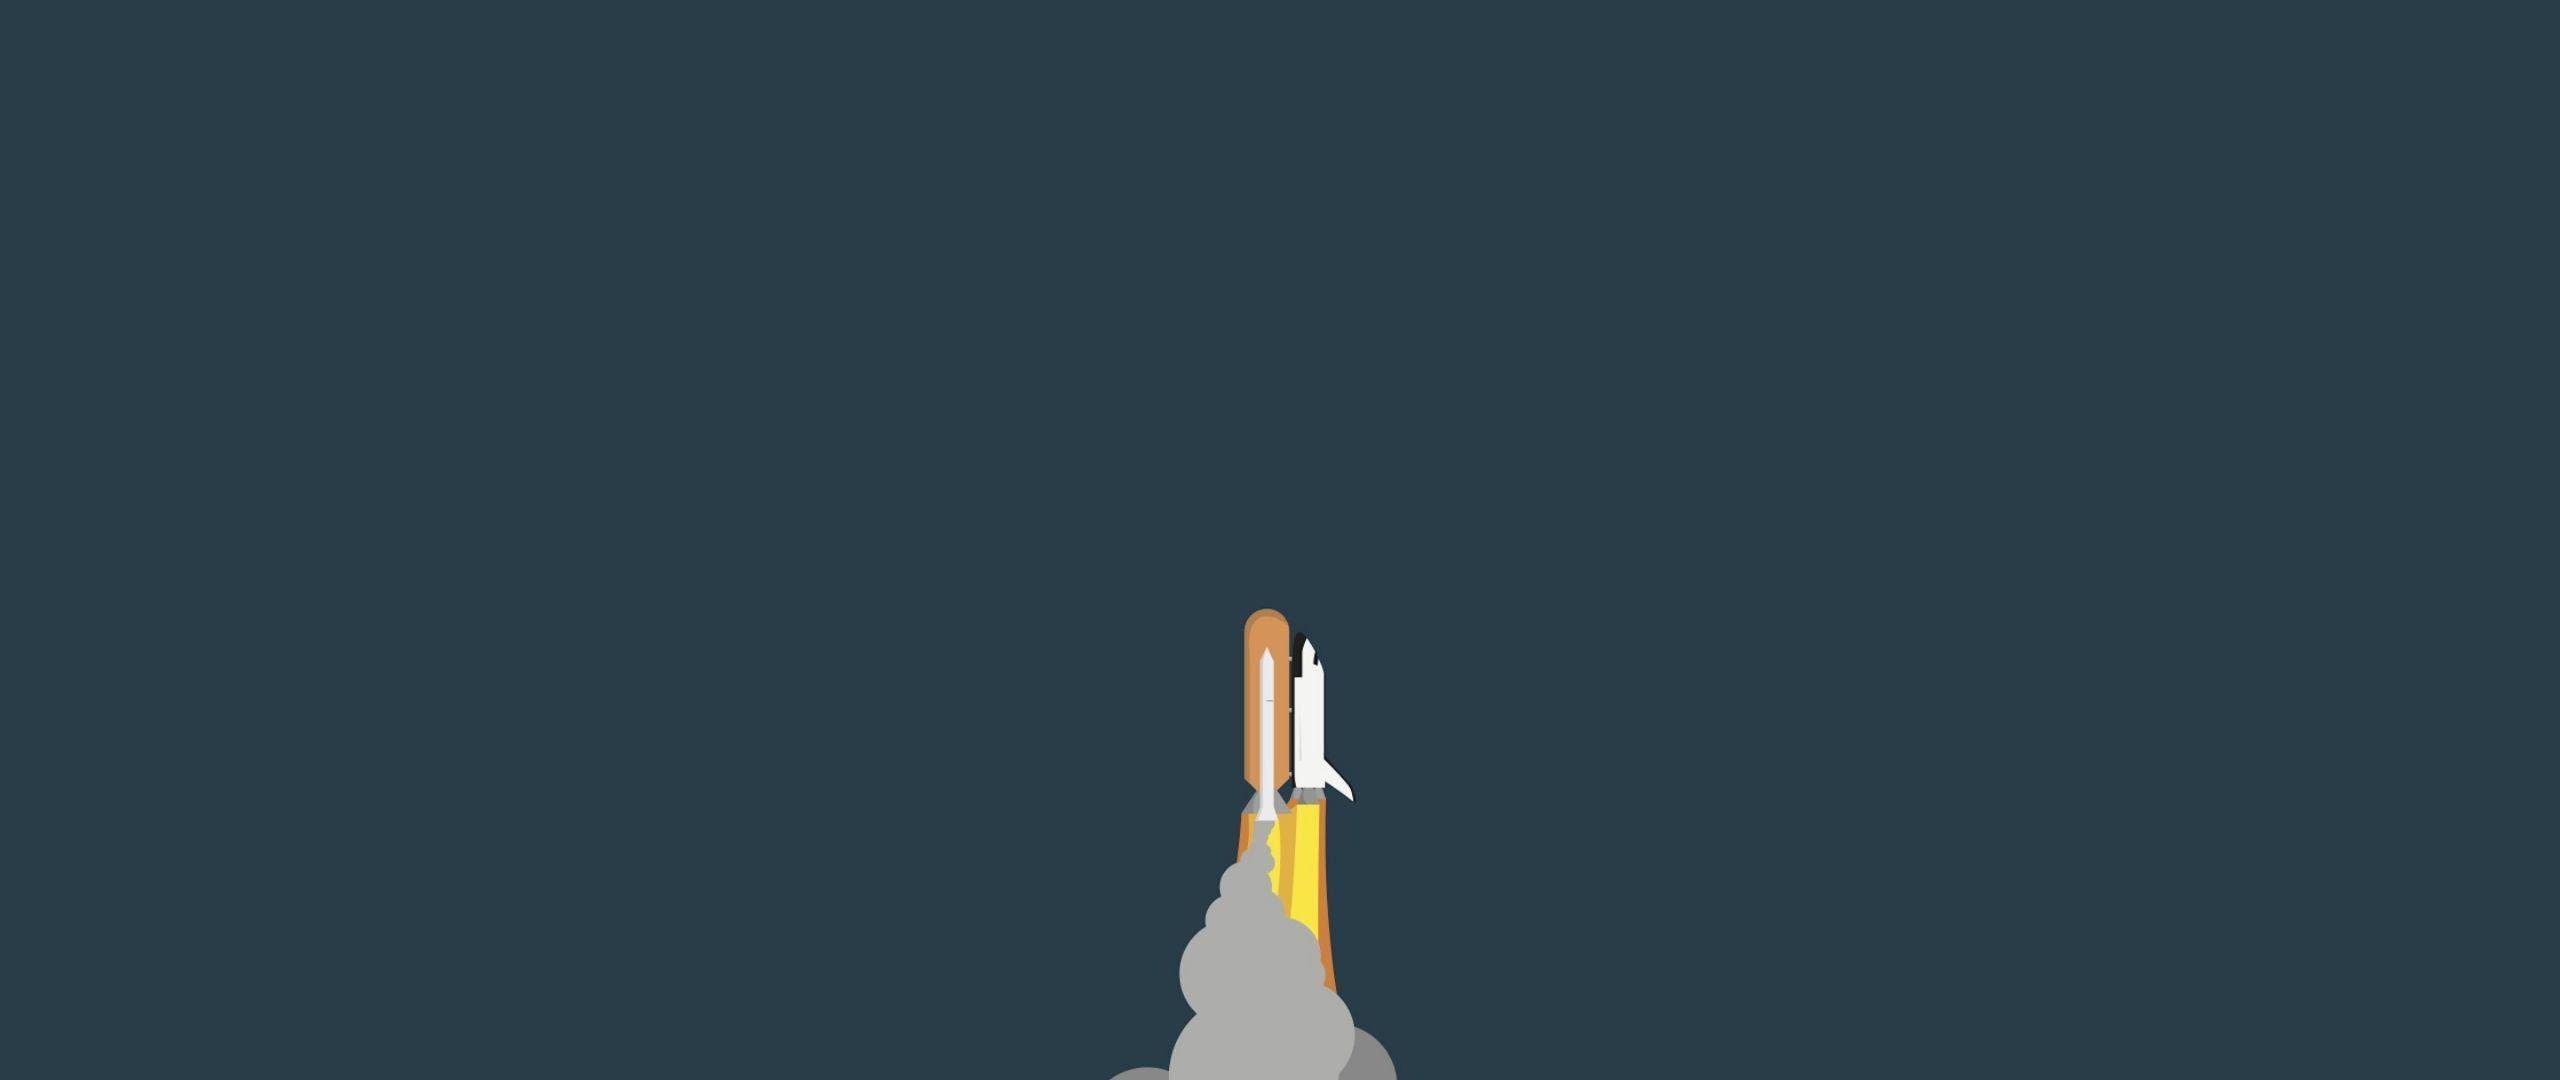 2560x1080 Download 2560x1080 wallpaper minimalist, space, rocket, clouds